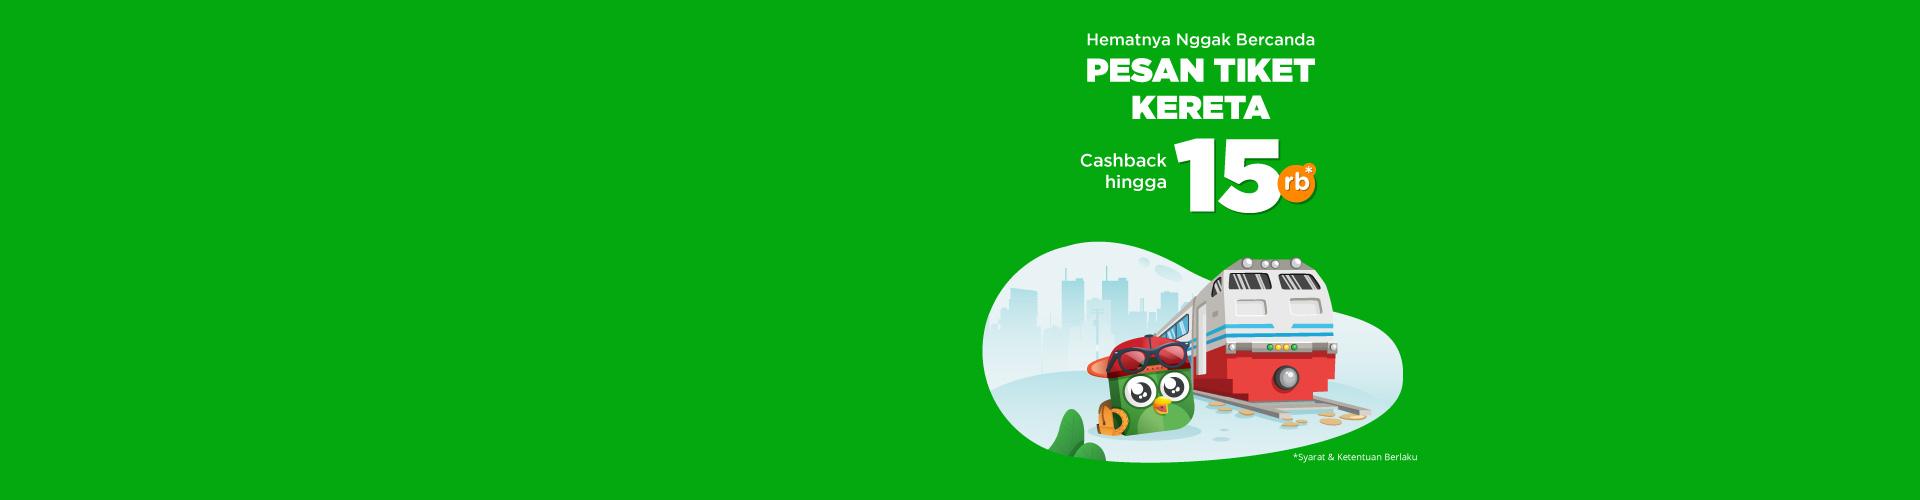 Hematnya Gak Bercanda! Dapatkan cashback 15rb pesan tiket kereta dengan KAI Pass. Beli vouchernya di sini yuk!